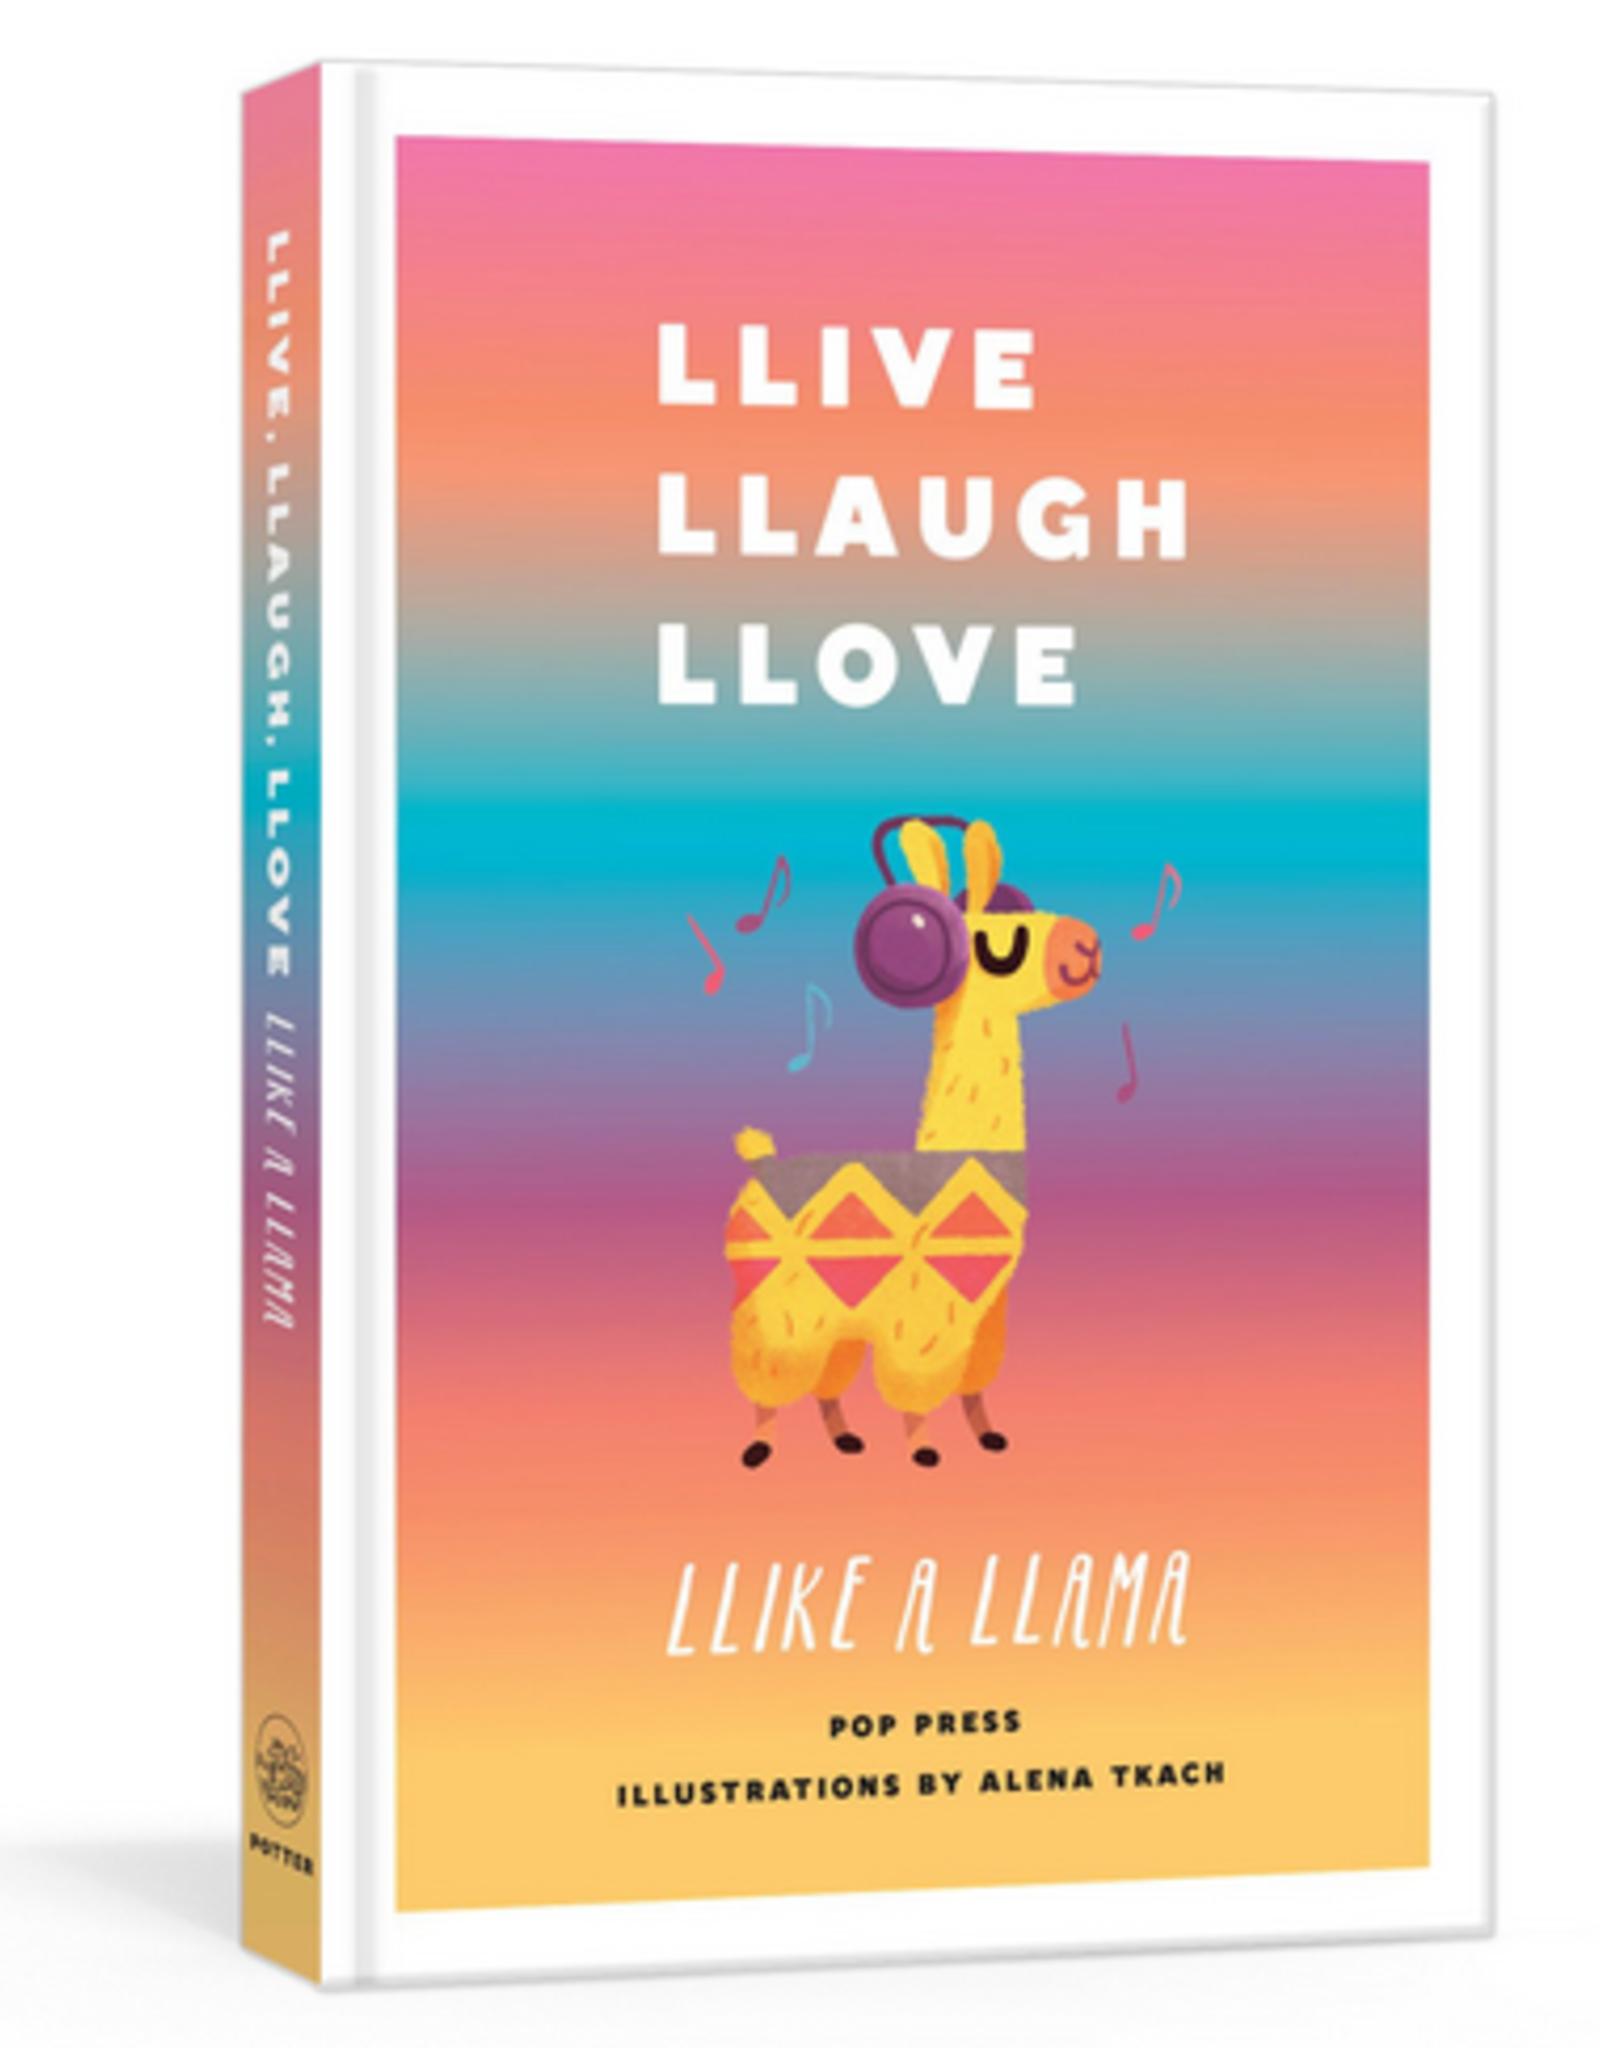 Llive Llaugh Llove Like a Llama